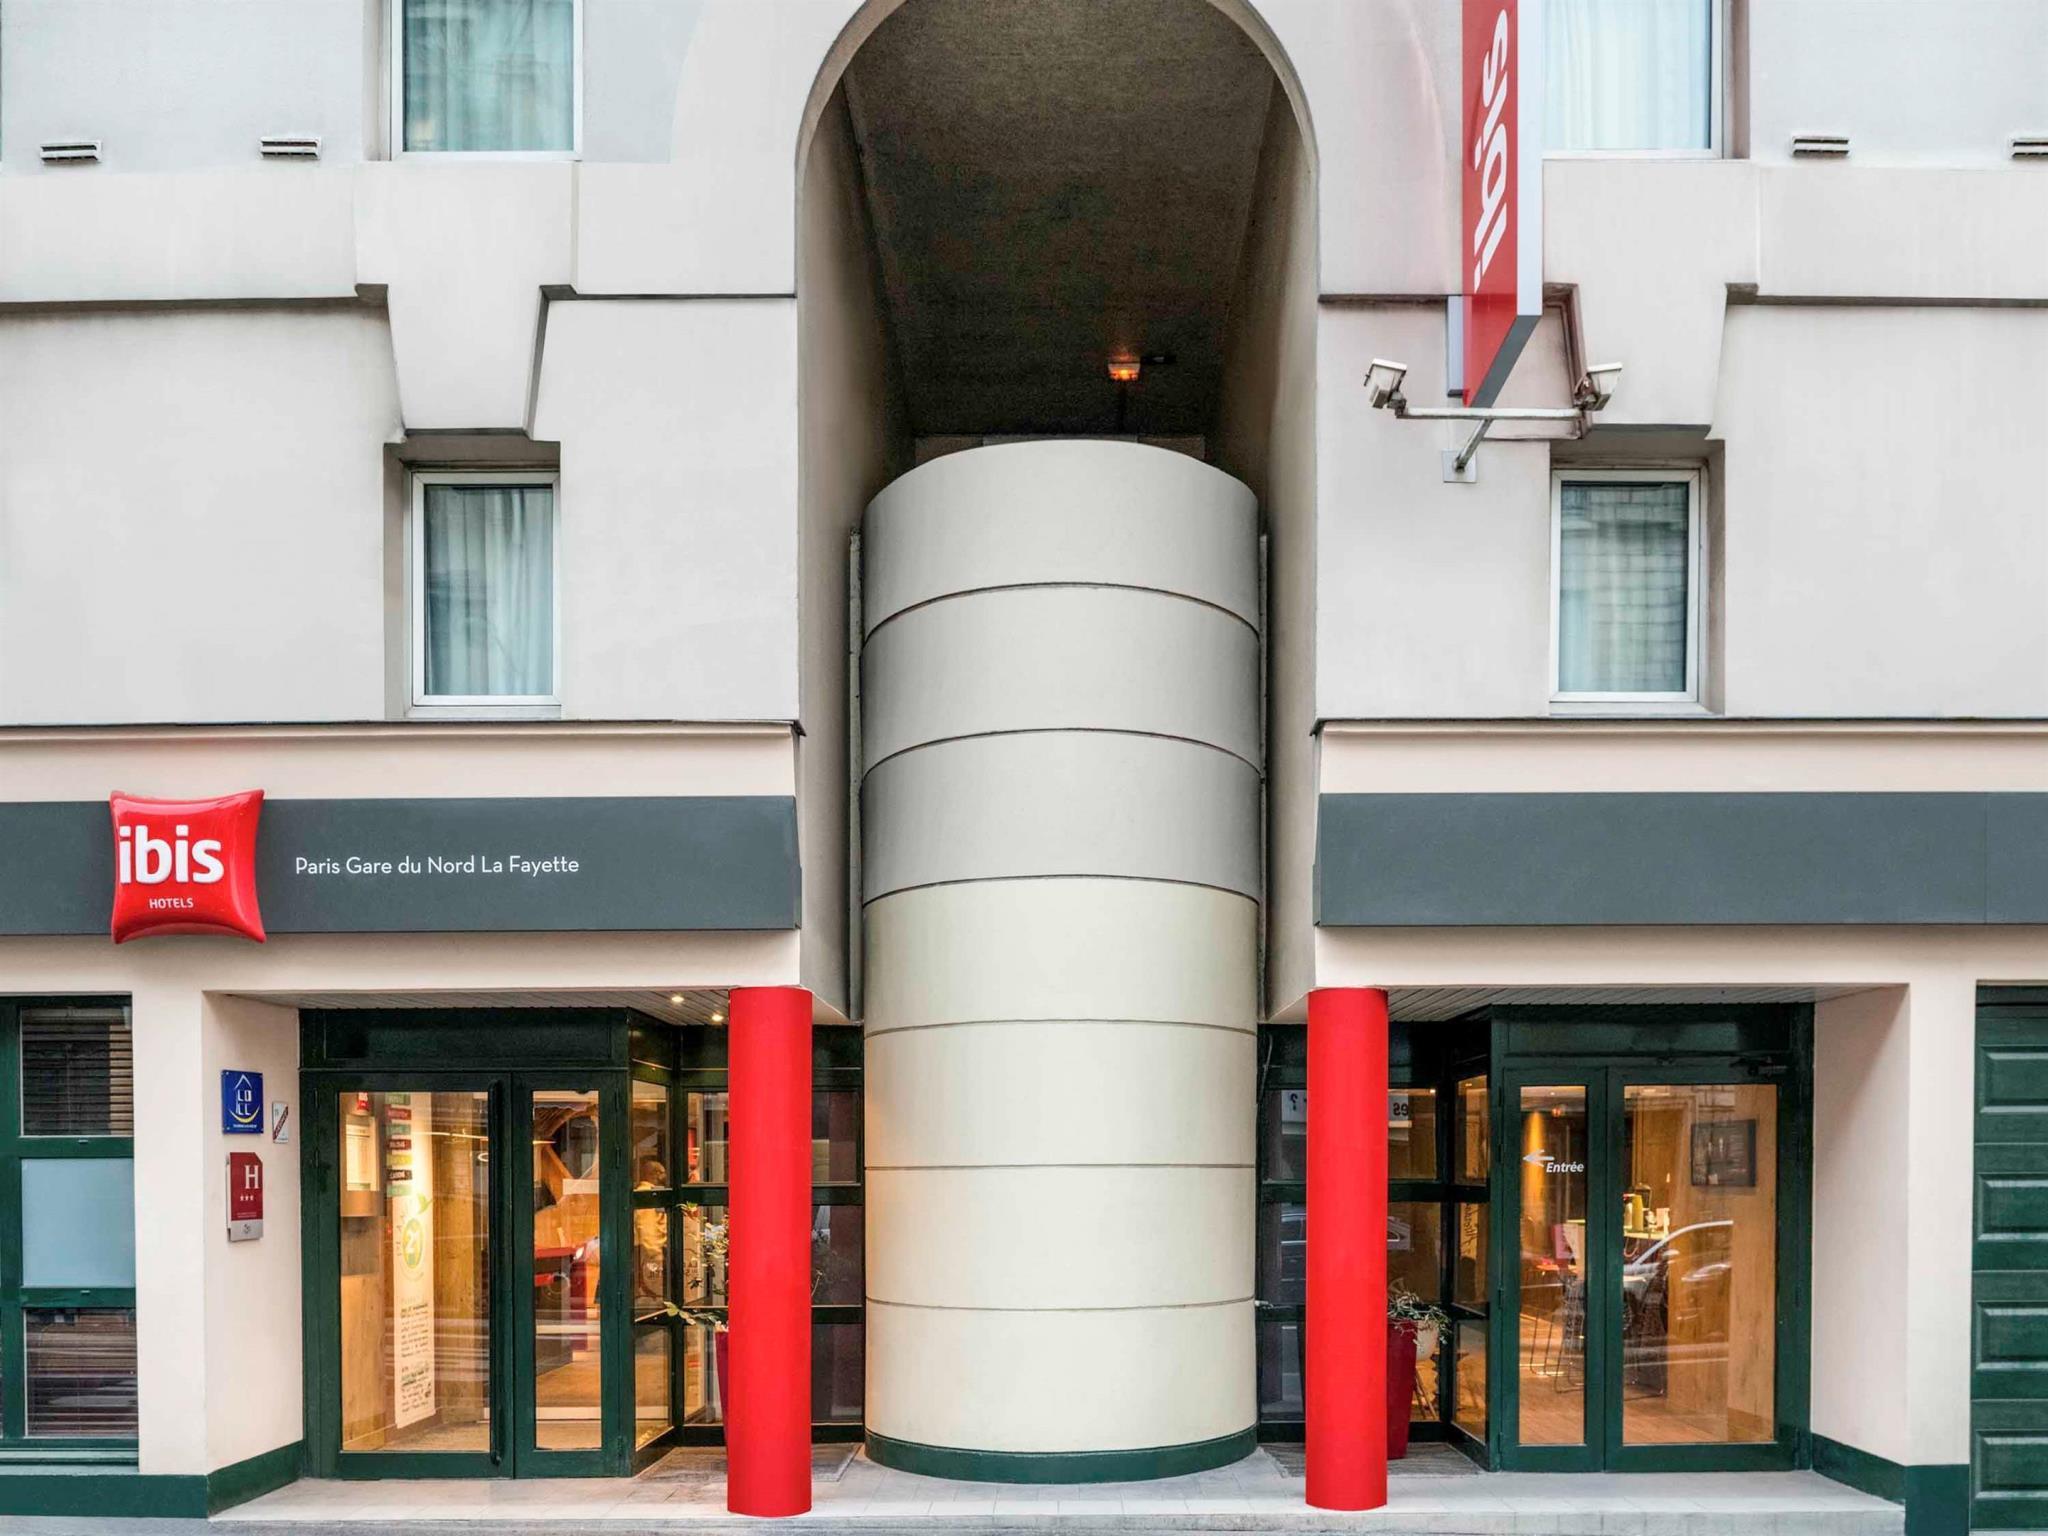 ibis paris gare du nord la fayette 10eme in france room deals rh agoda com